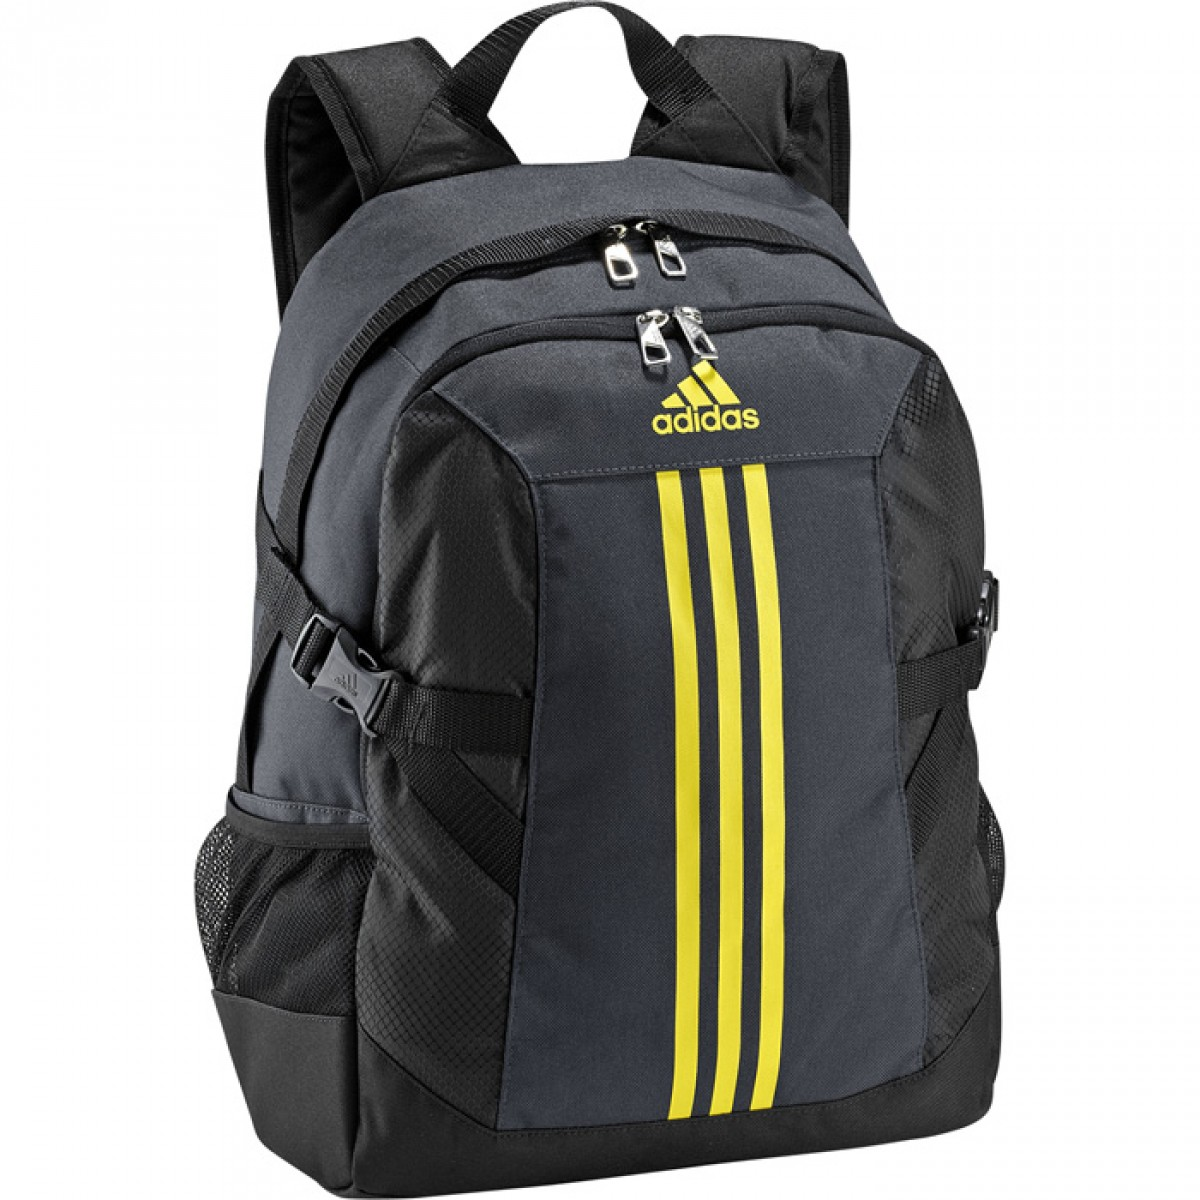 Okul Hediyen Adidas'tan 51